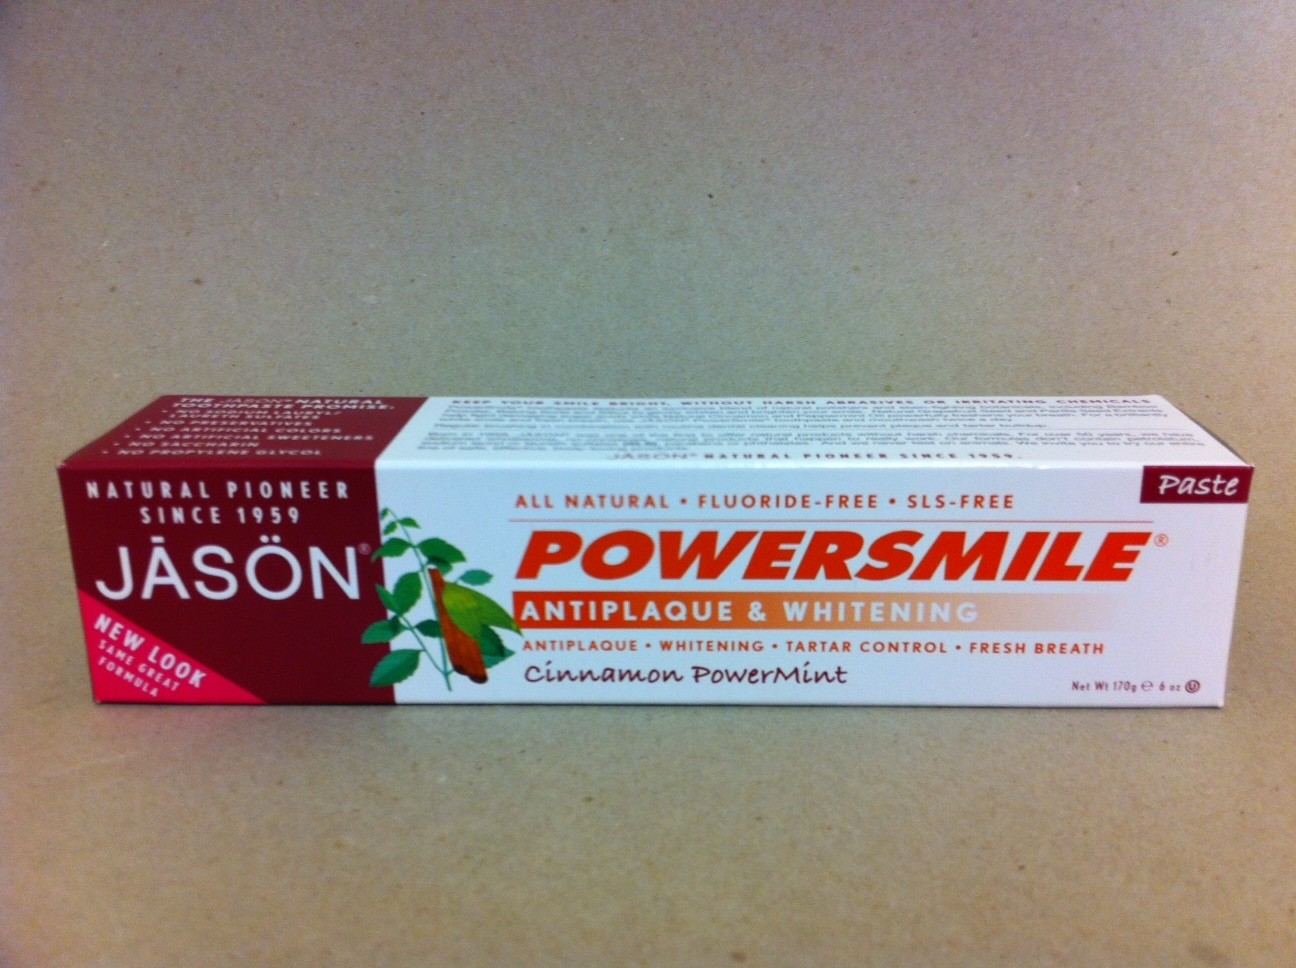 Jason Cinnamon PowerMint Toothpaste